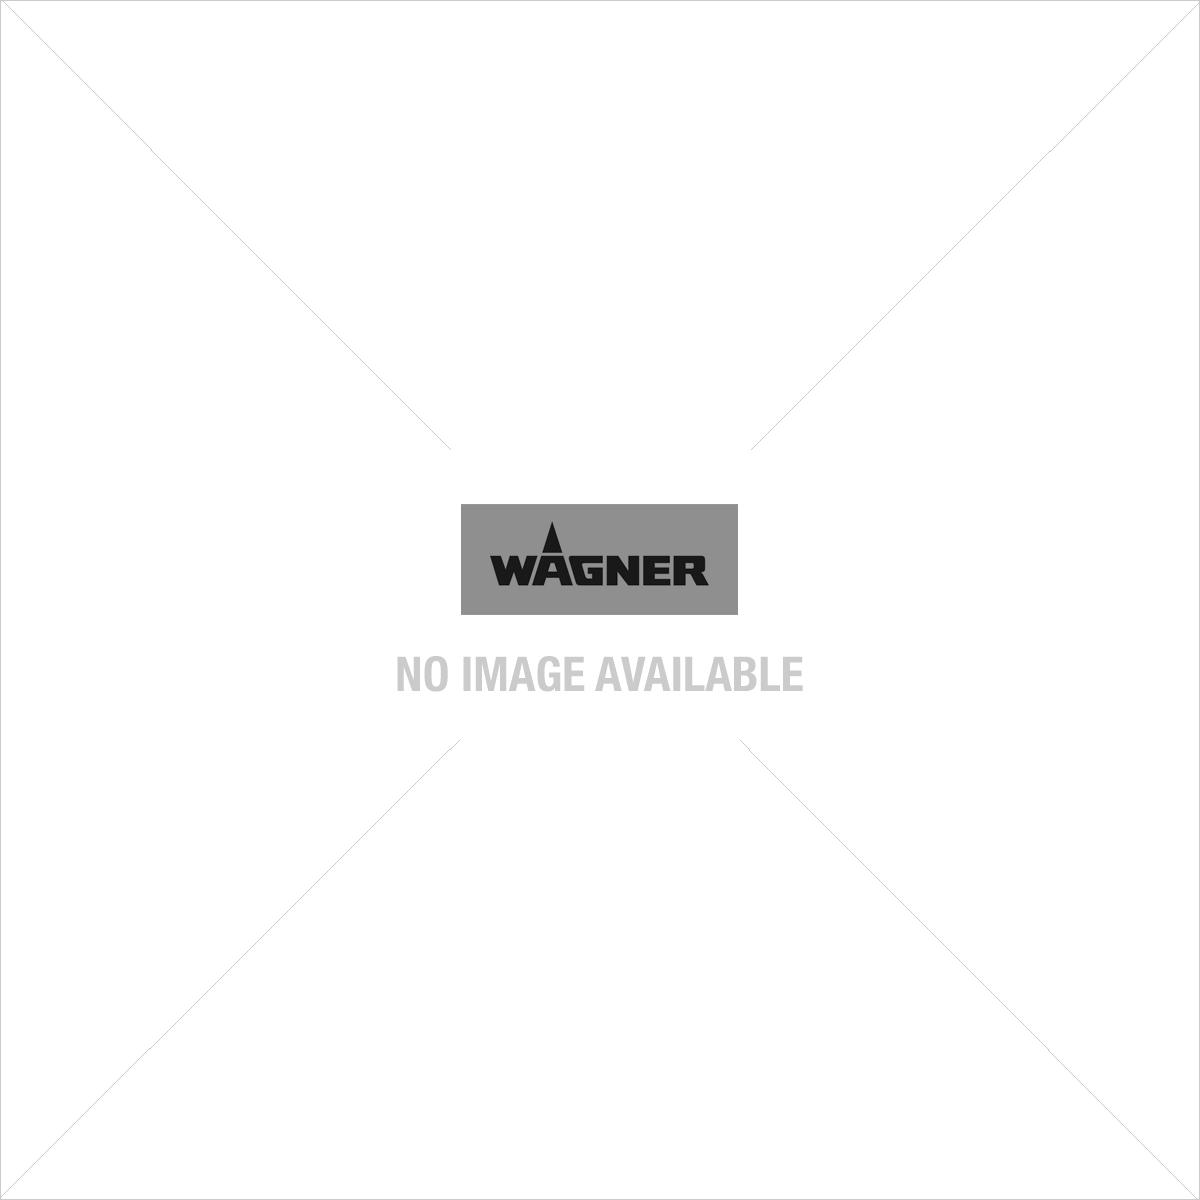 robuuste behangafstomer van Wagner